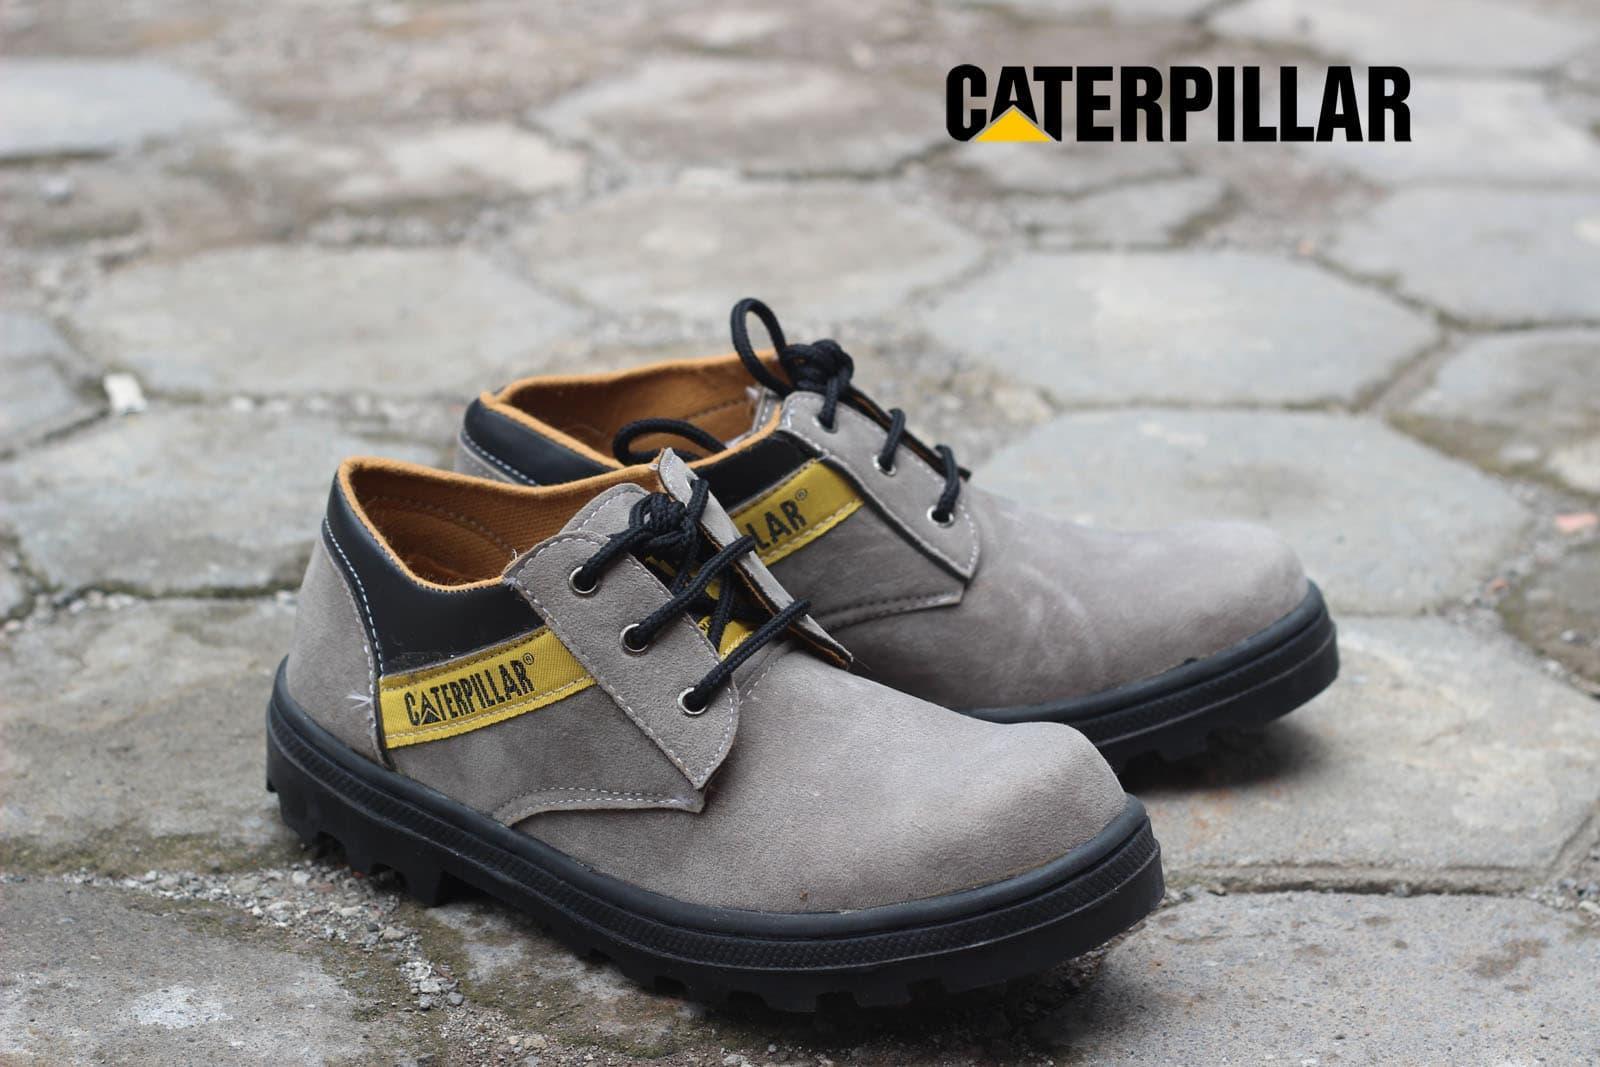 38 Harga Flash Sale Sepatu Boots 2018 Caterpillar Low Suede Terlaris Safety Pria Pendek Warna Abu